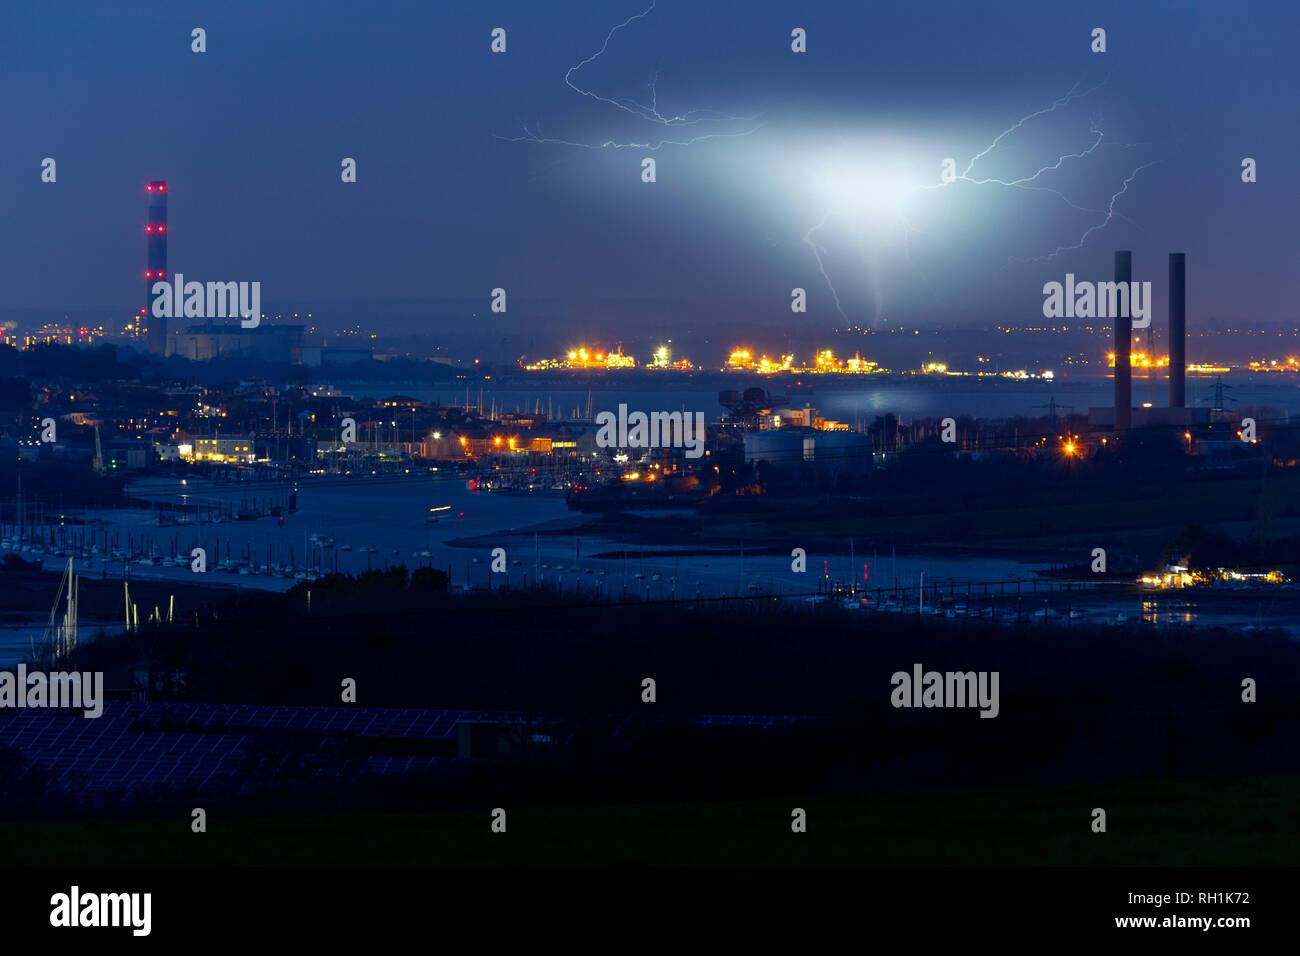 Power Station, Solar Farm, View, River Medina, Medham, Cowes, Solent, Fawley, Southampton, Isle of Wight, England, UK, Stock Photo